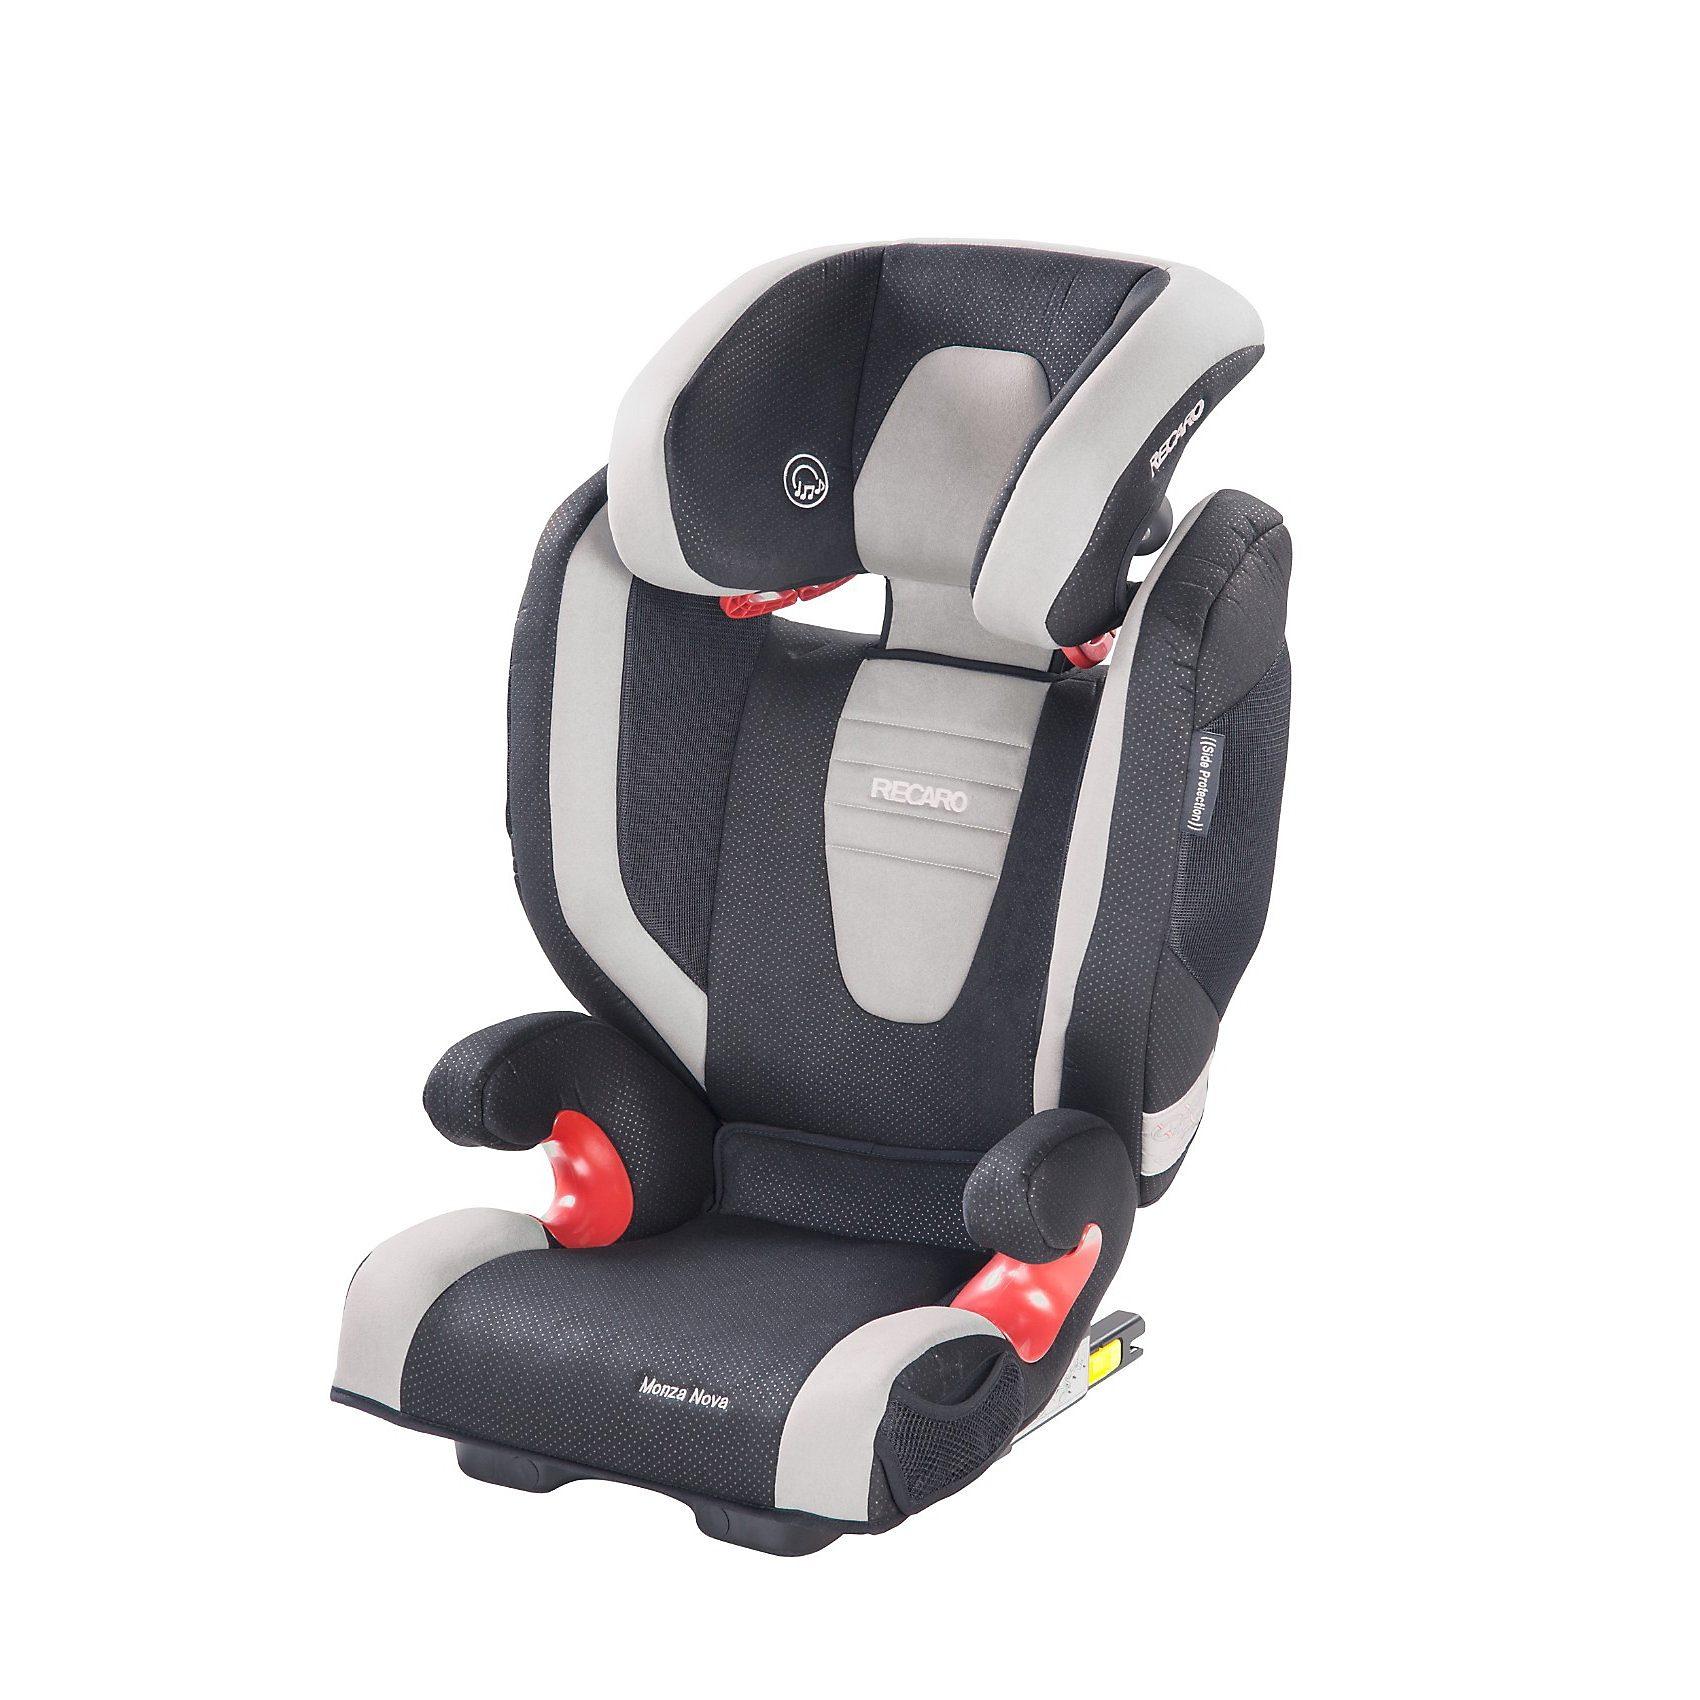 RECARO Auto-Kindersitz Monza Nova 2 Seatfix, Graphite